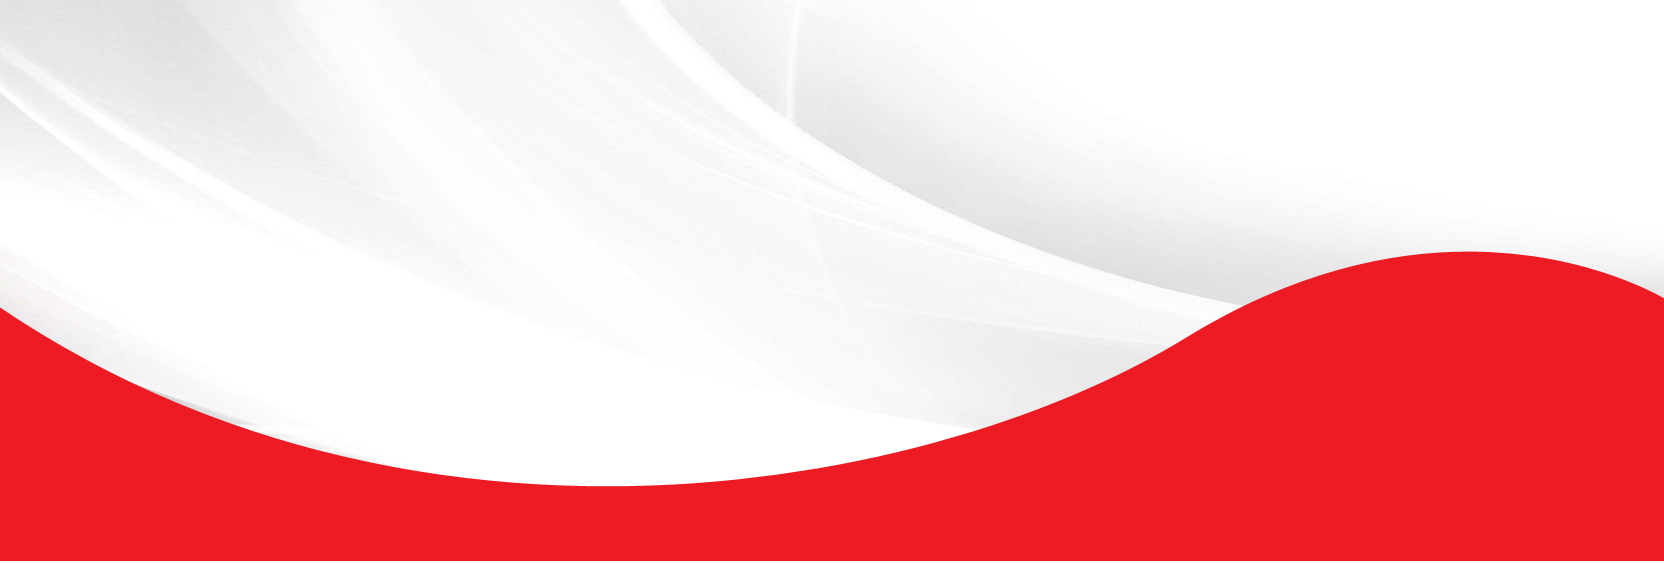 joinner-sistemas-banner-home-conheca-01